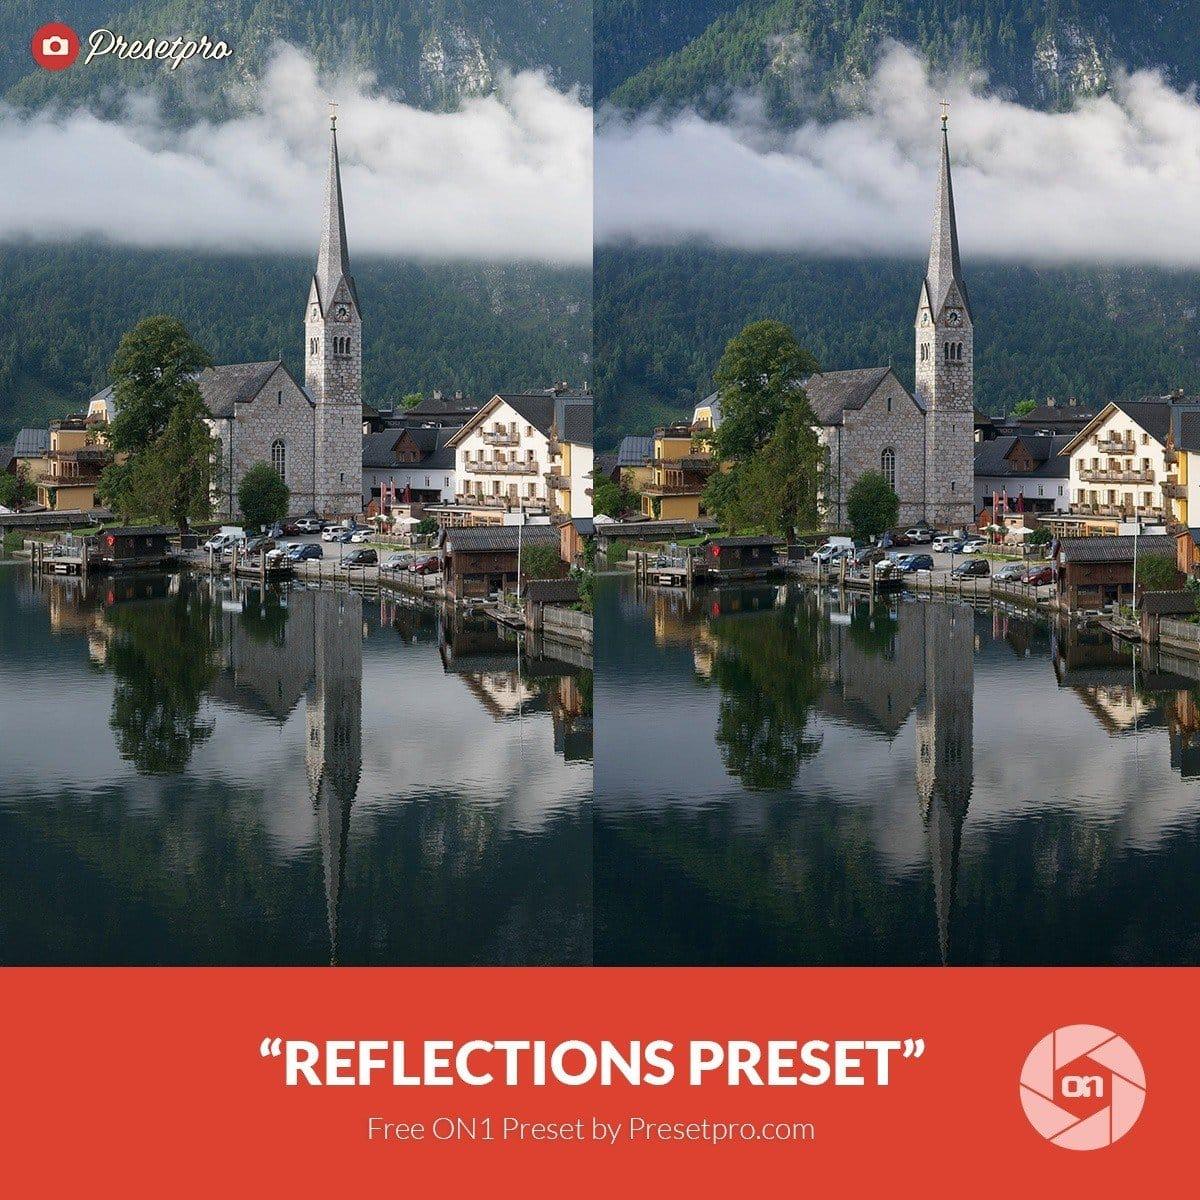 Free-On1-Preset-Reflections-Presetpro.com